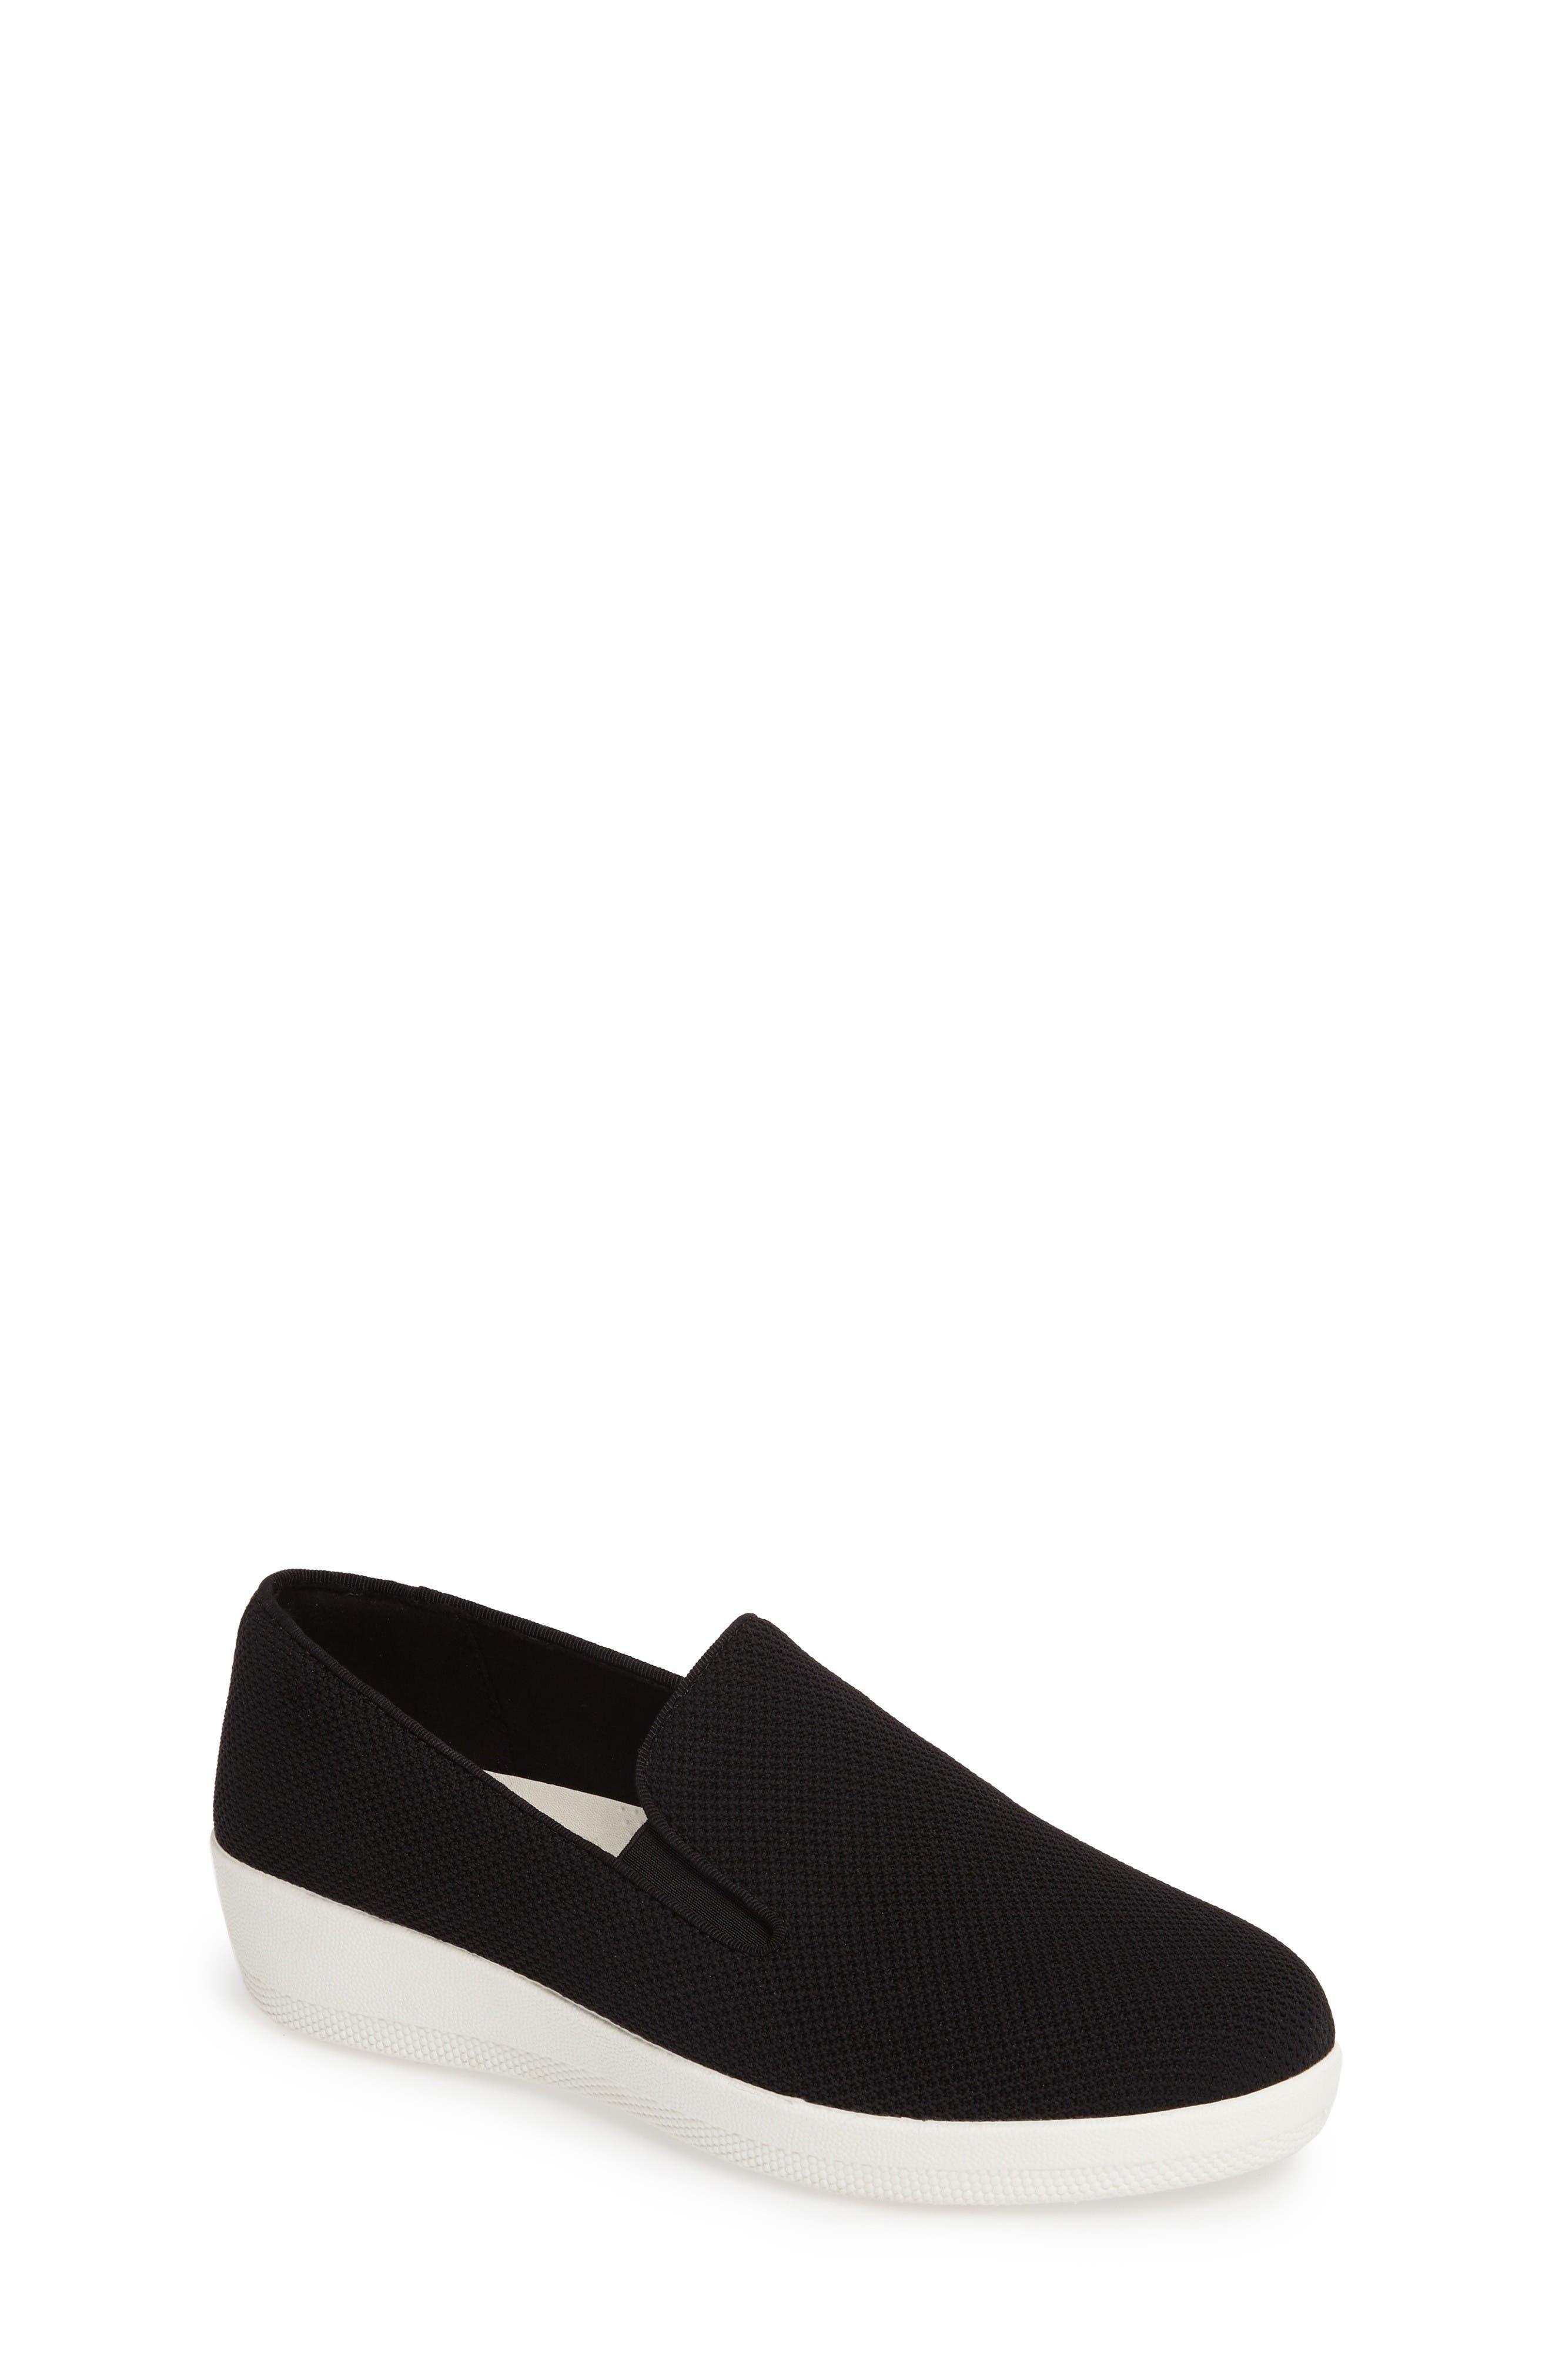 FitFlop Superskate Knit Loafer (Women)